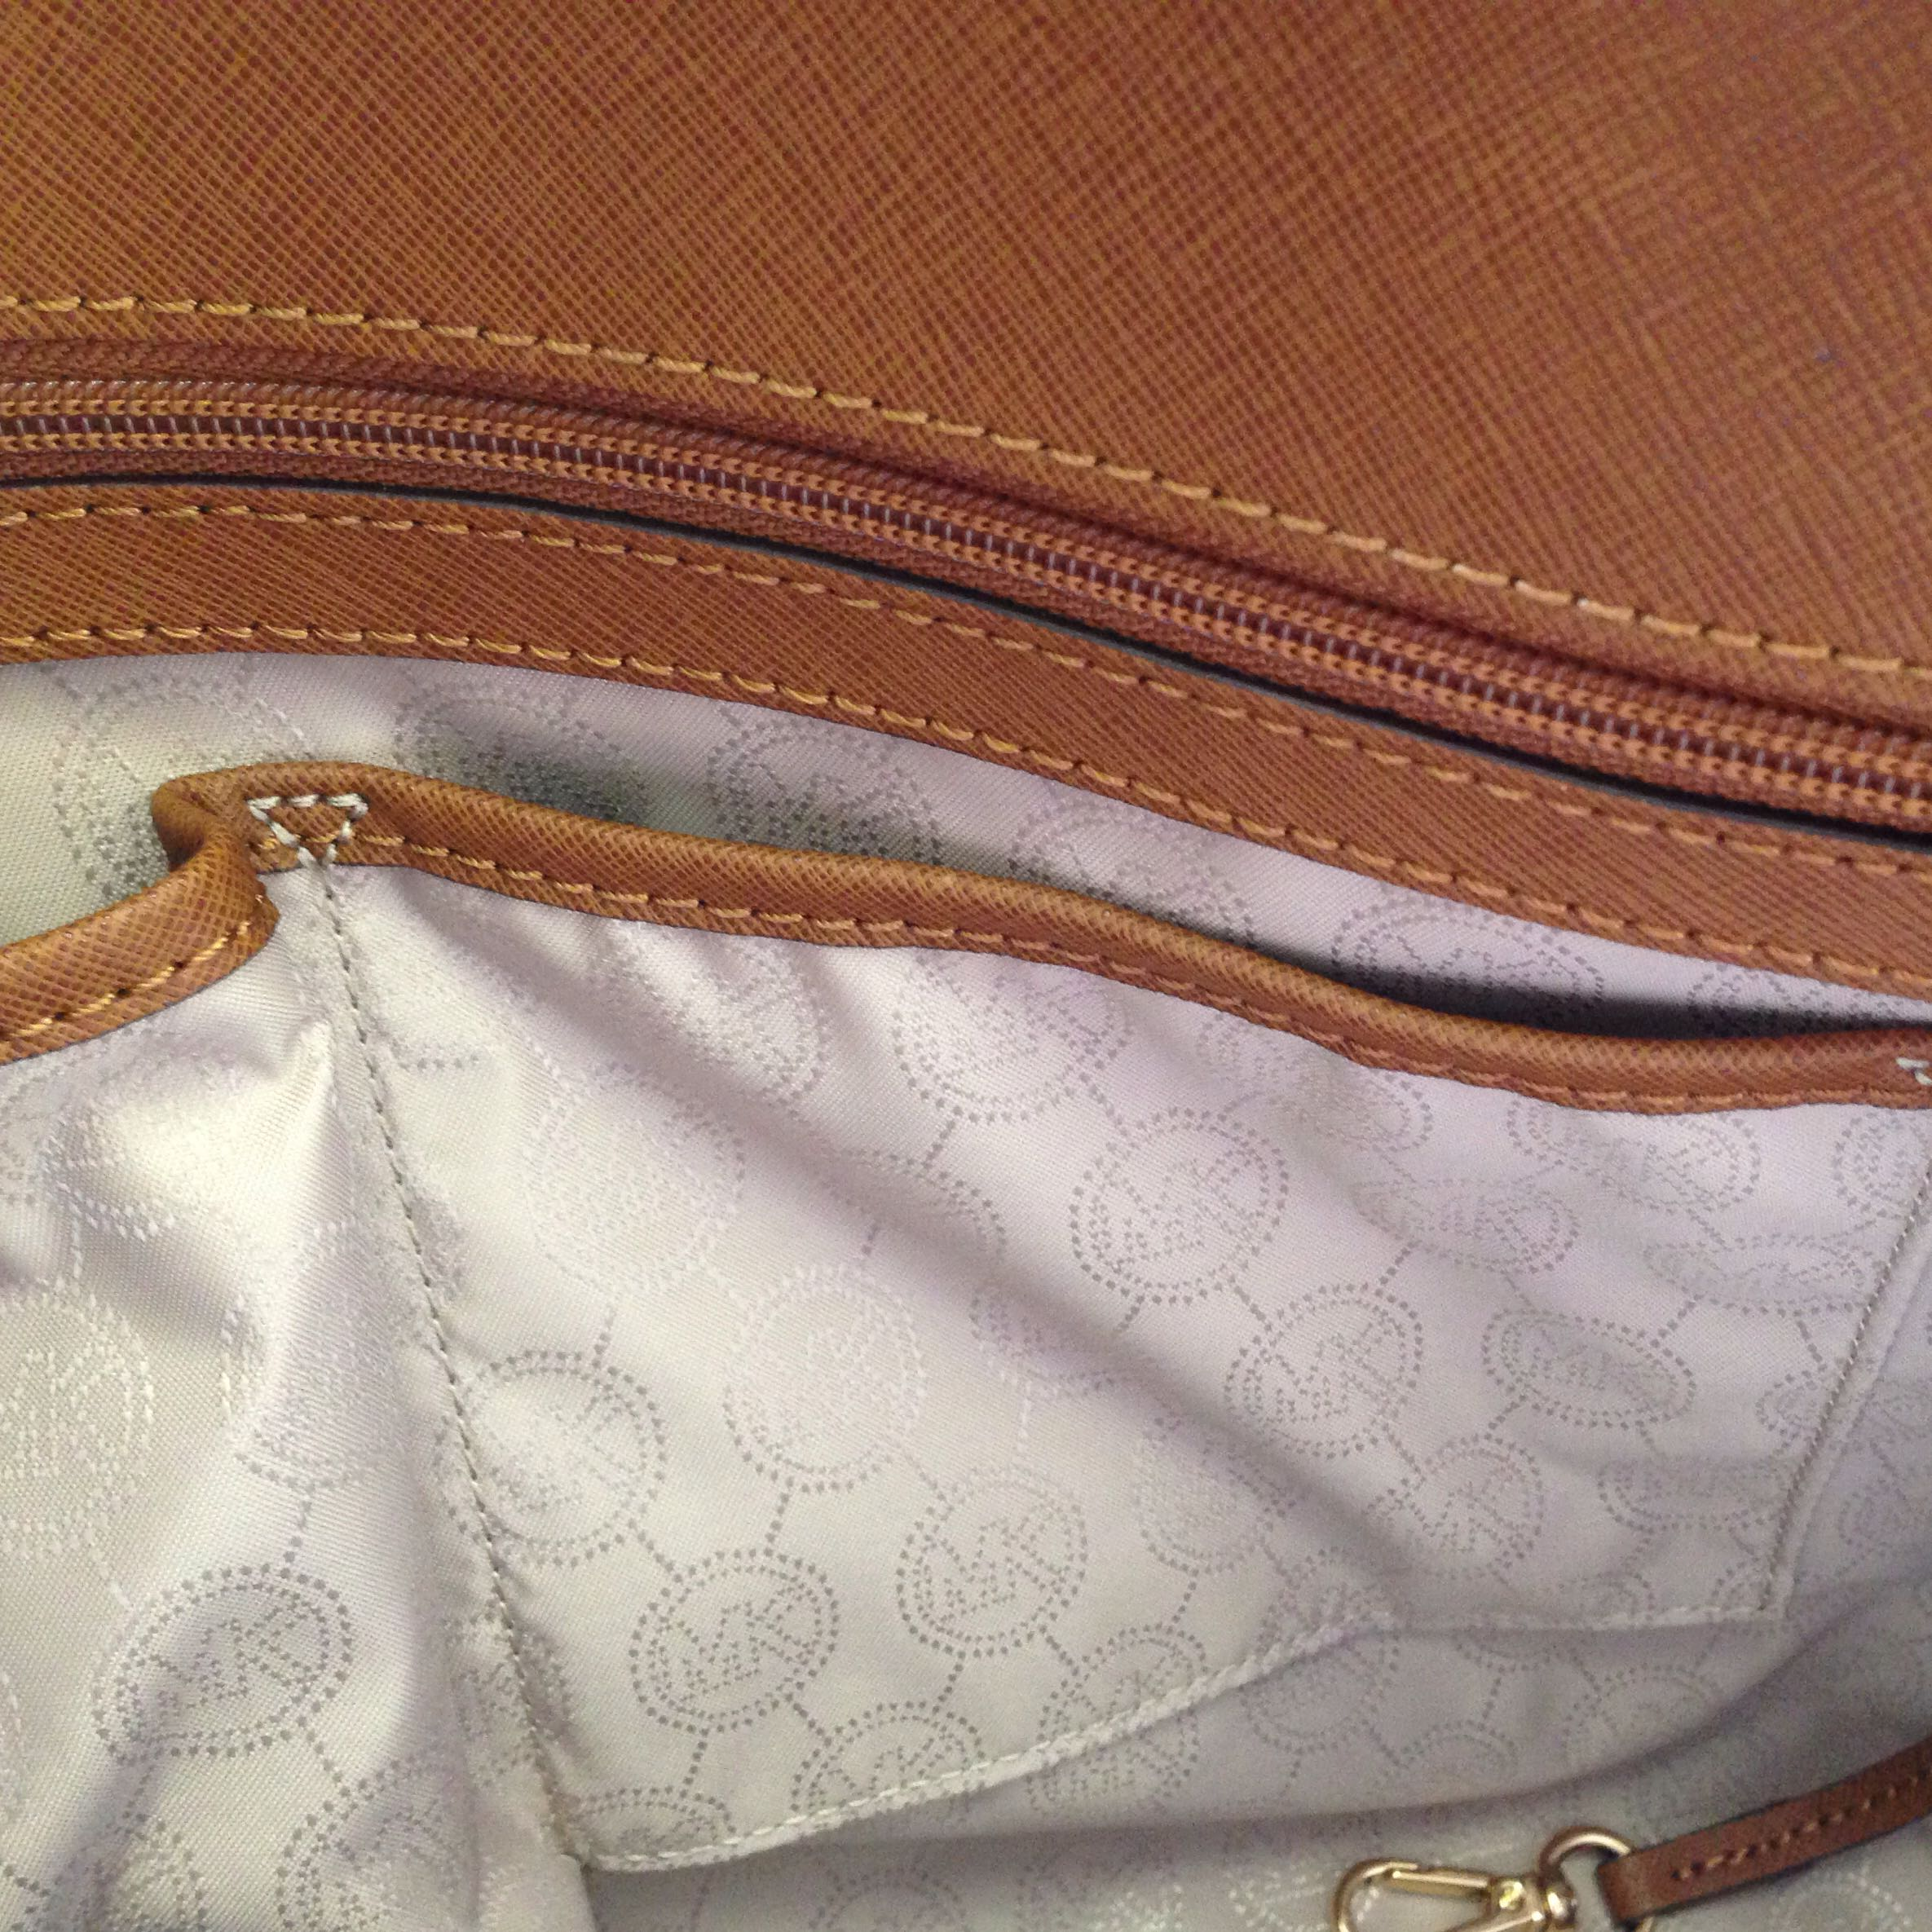 Michael Kors Taschen Ebay